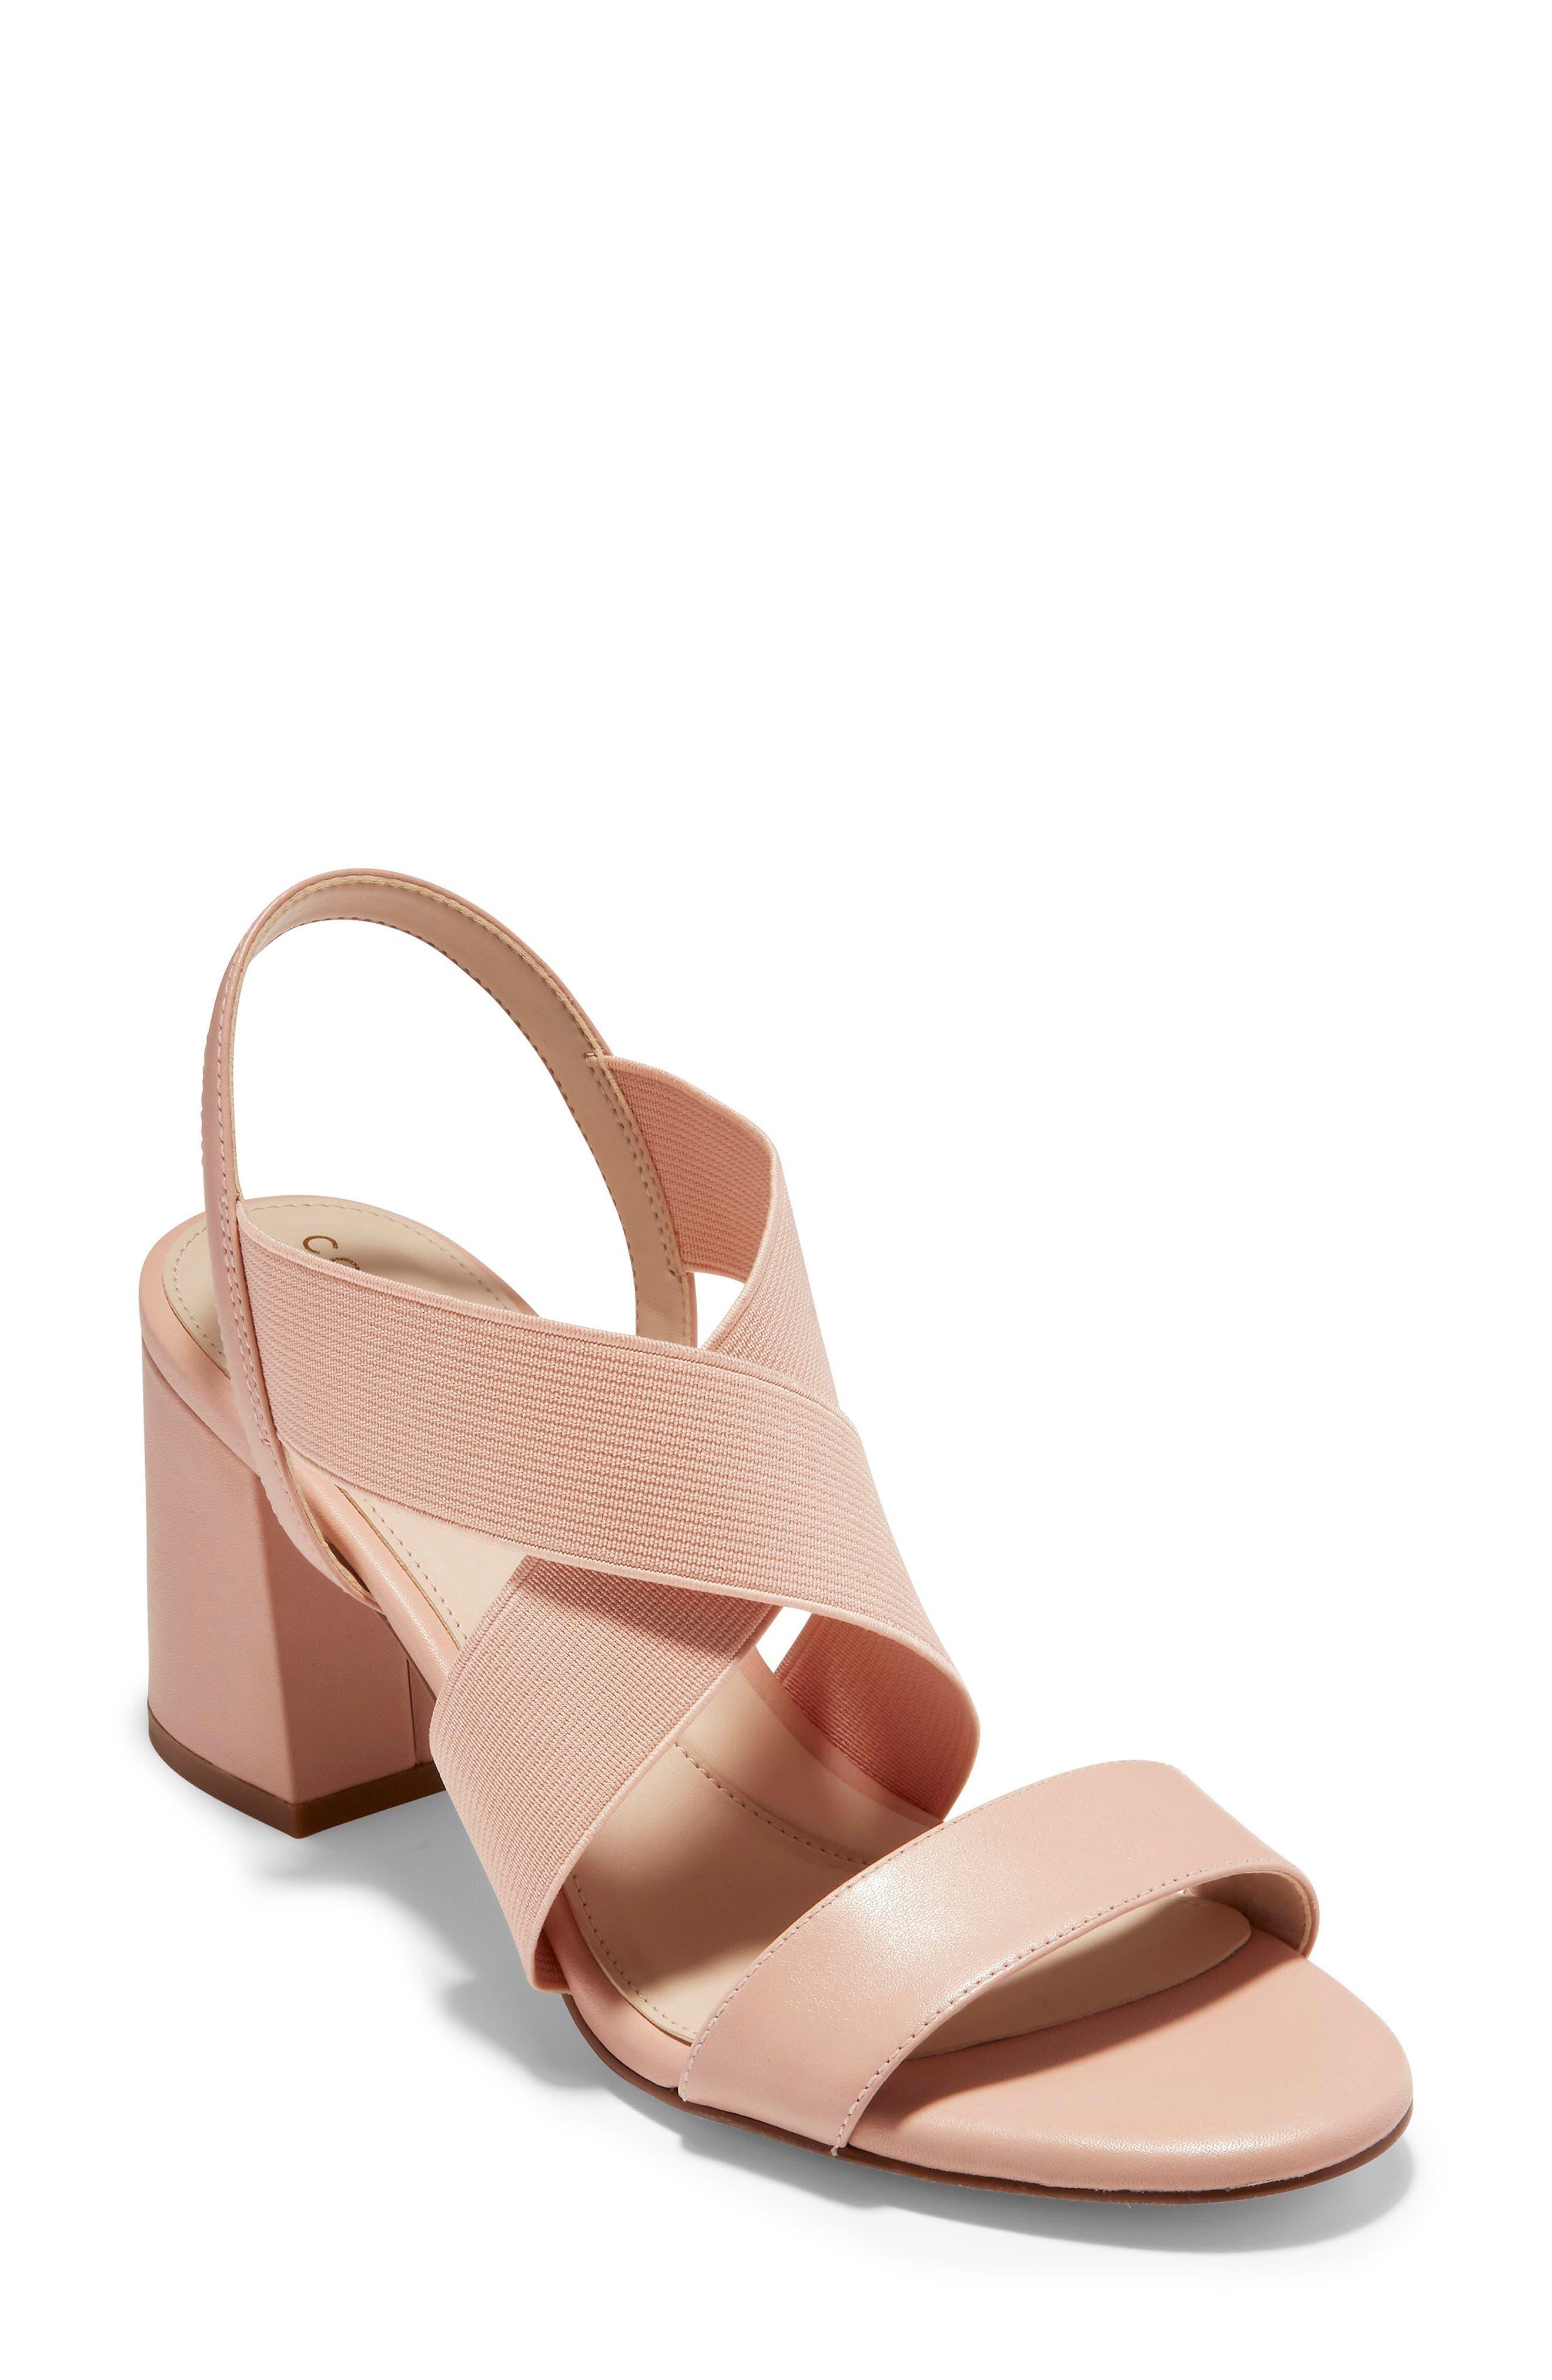 Cole Haan | Aniston Sandal | Nordstrom Rack